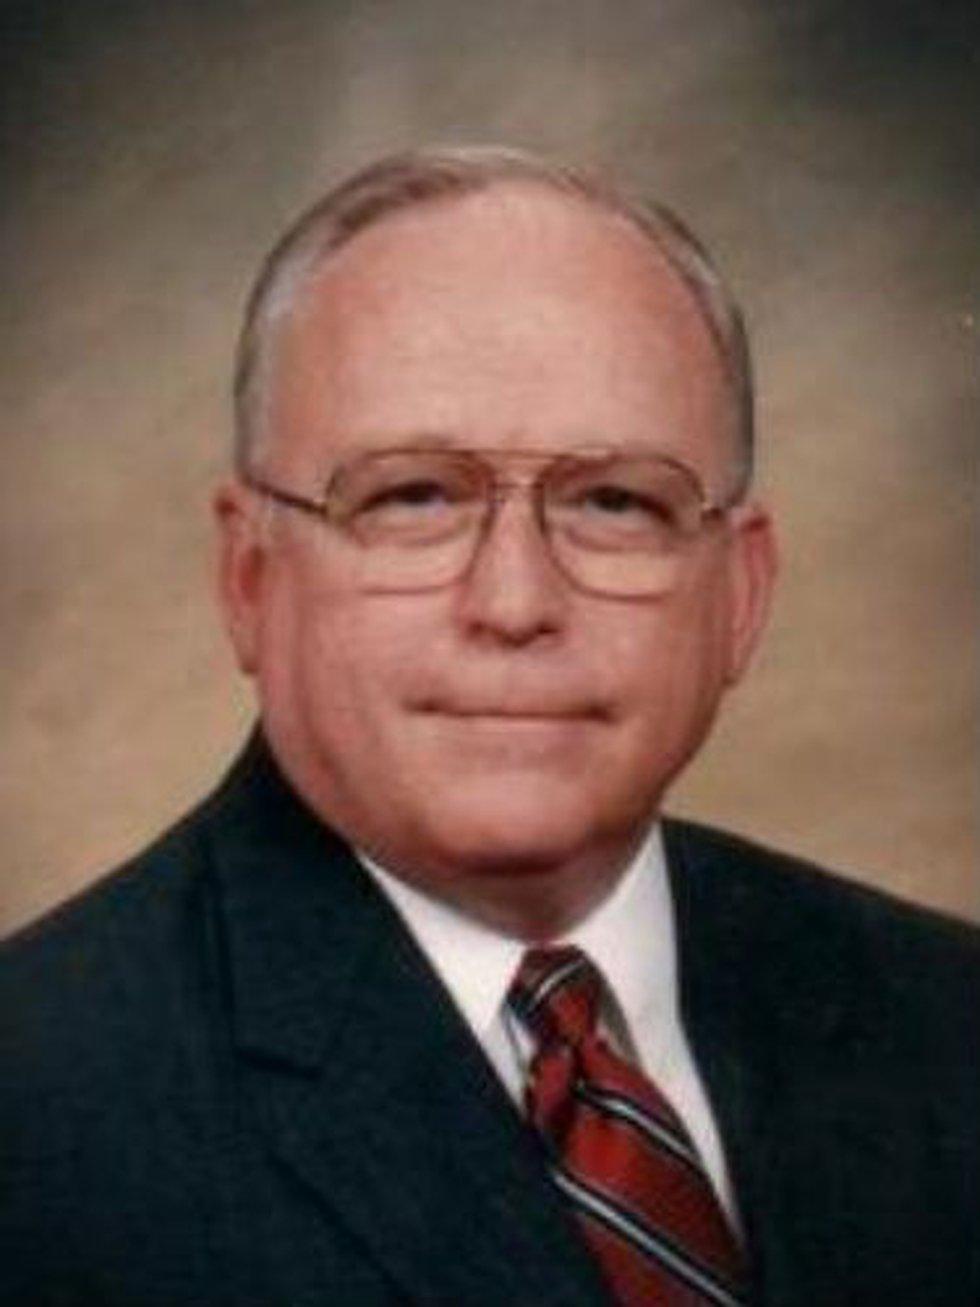 Robert L. Barber (Photo courtesy of Hankins & Whittington Funeral Service)